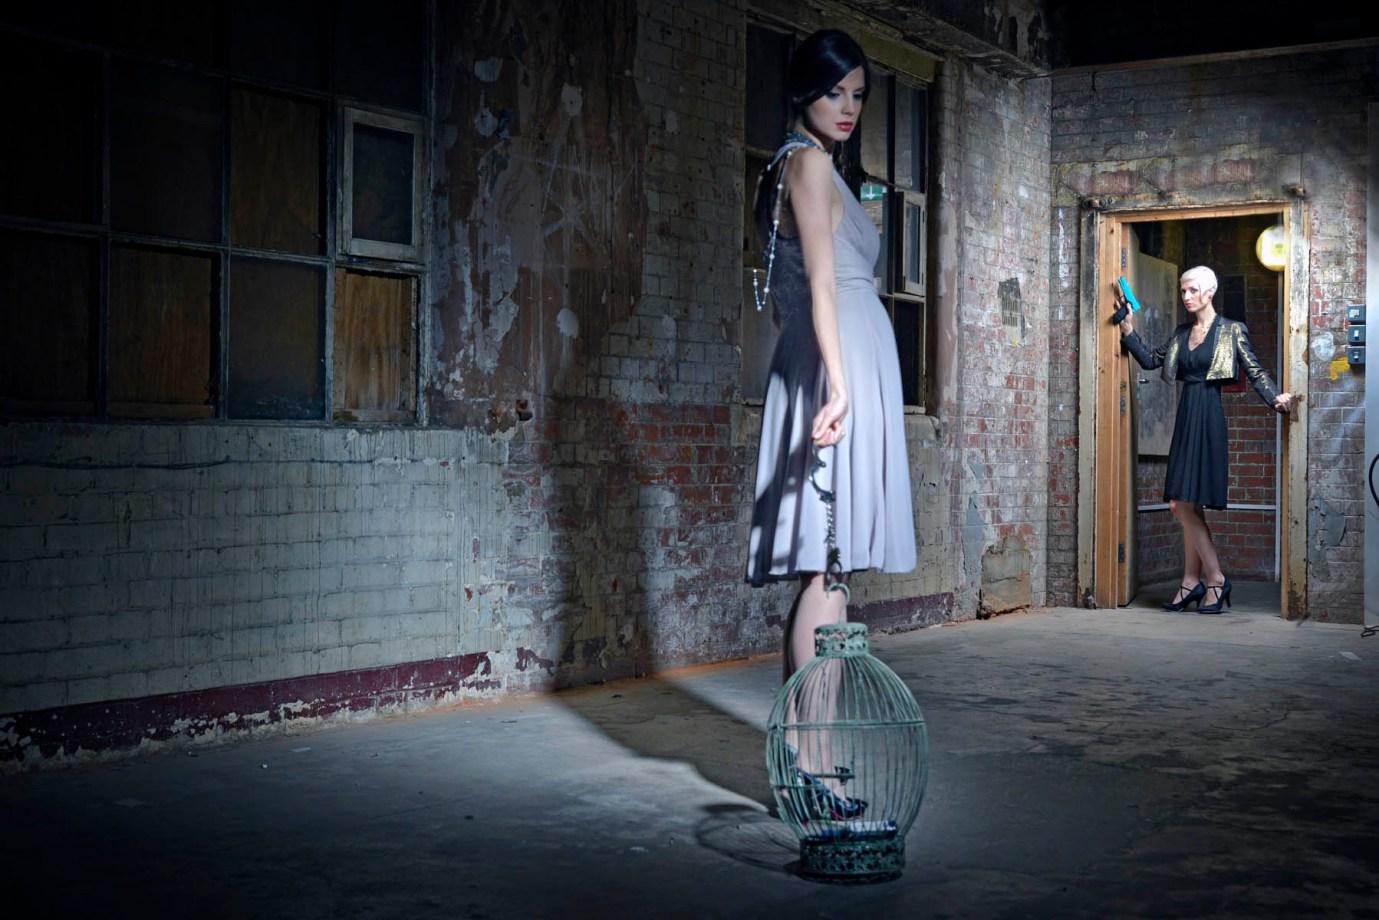 Fashion_lifestyle_photographer_london (8)